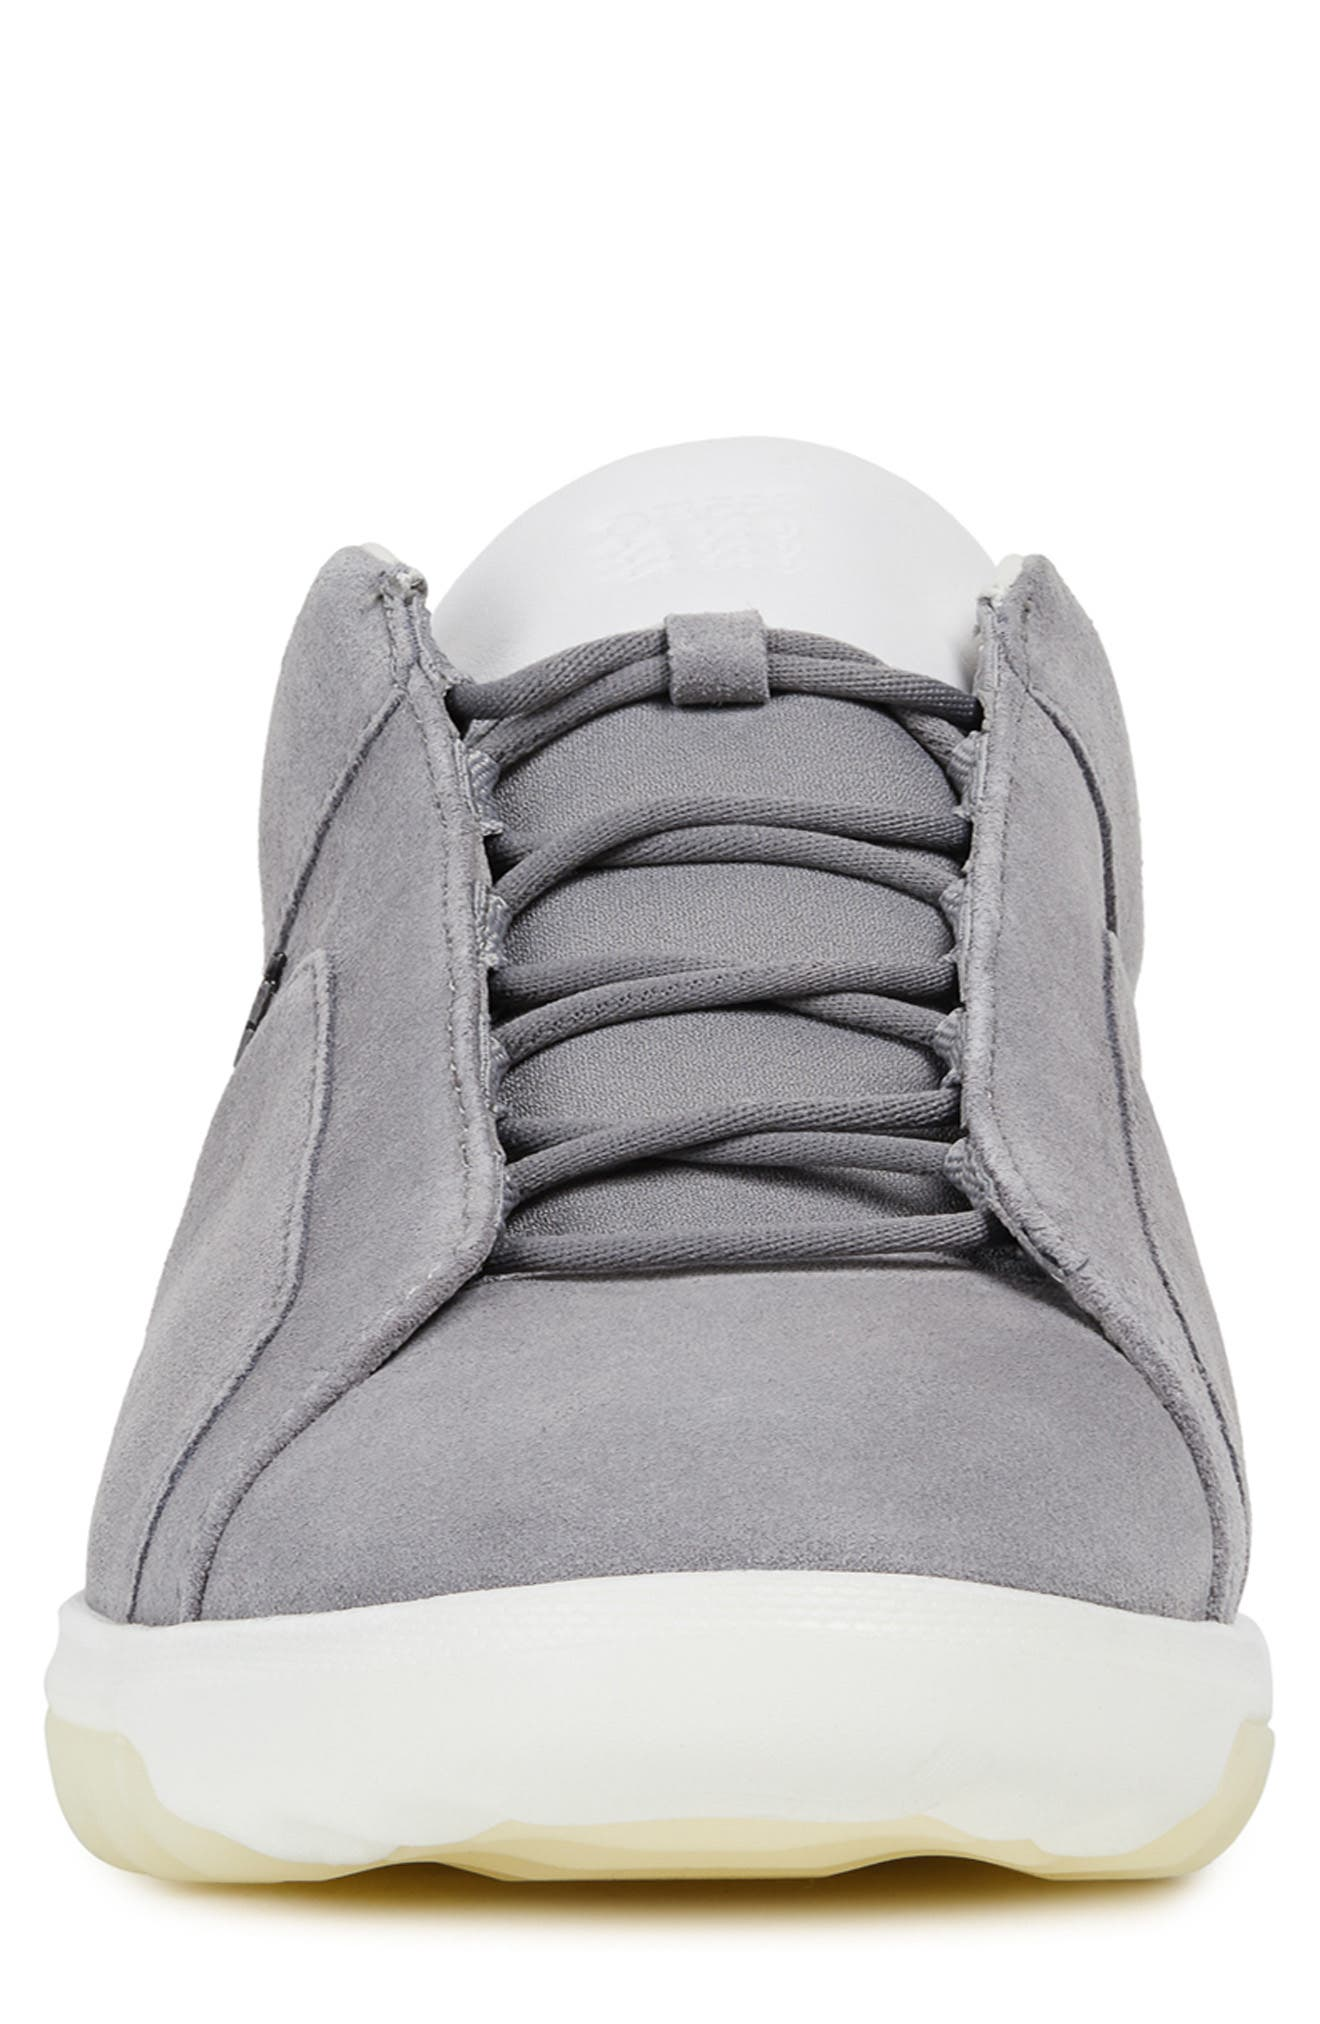 Nexside 1 Sneaker,                             Alternate thumbnail 4, color,                             STONE